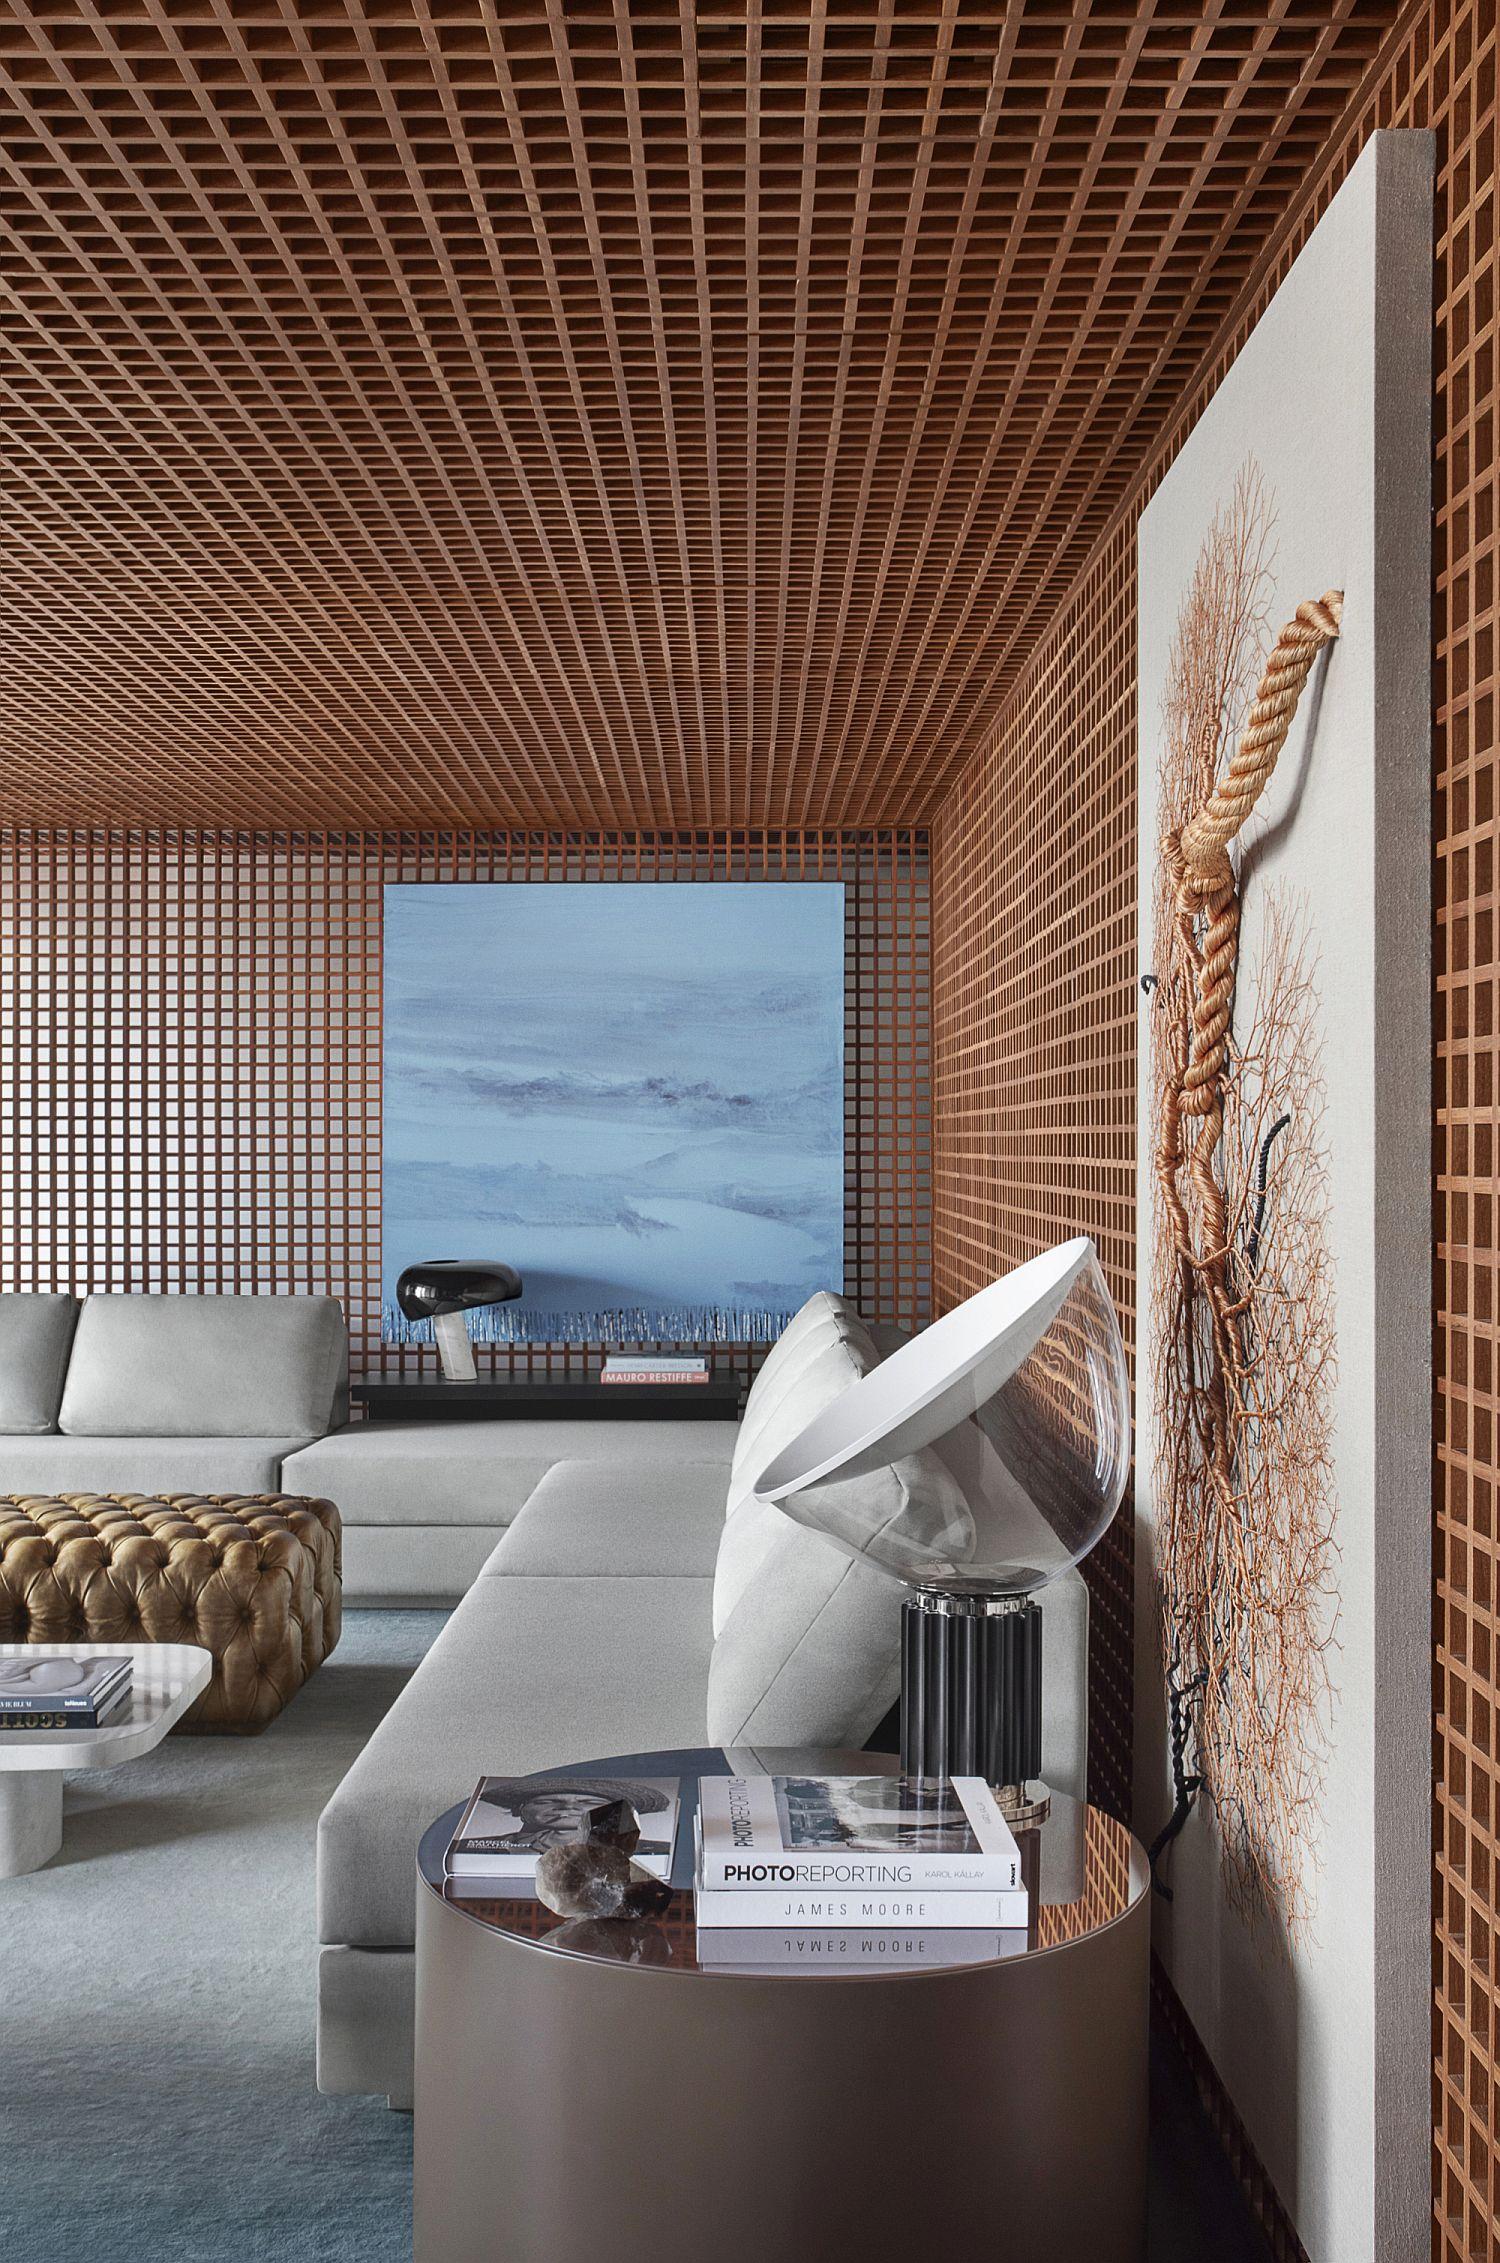 Grid-House-gets-its-name-from-custom-wood-framework-inside-its-home